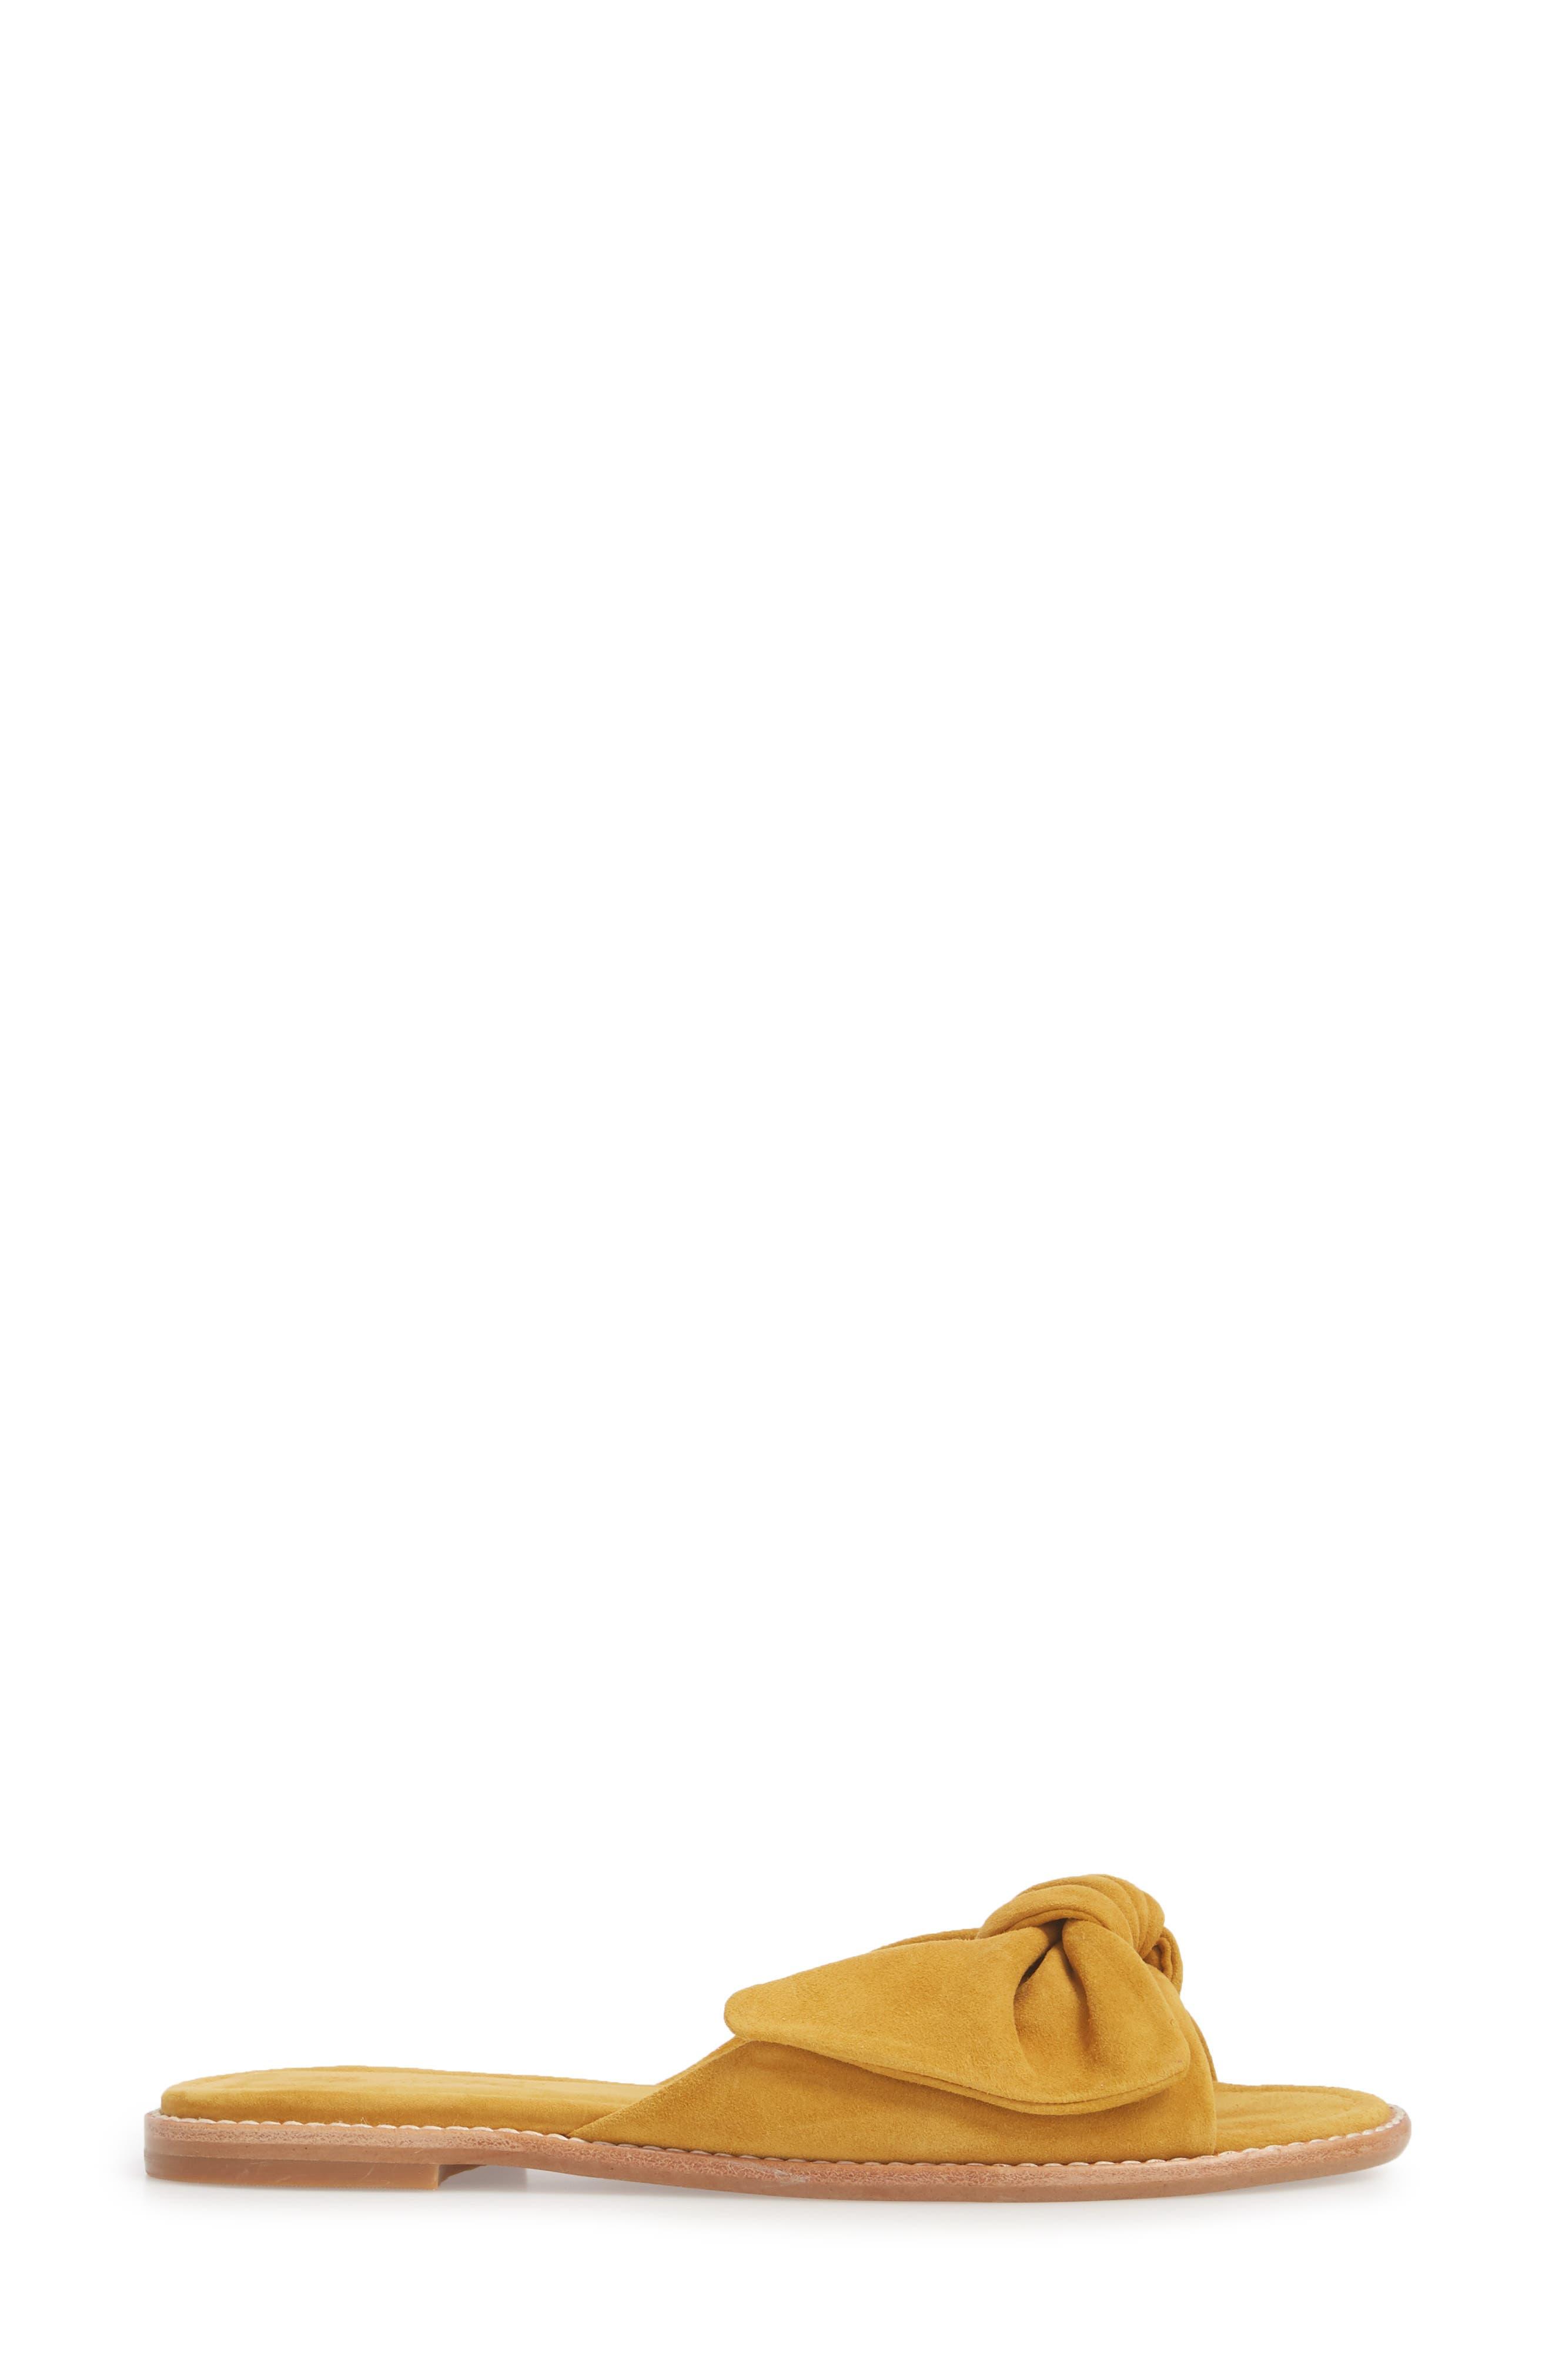 Naida Slide Sandal,                             Alternate thumbnail 3, color,                             Cider Leather